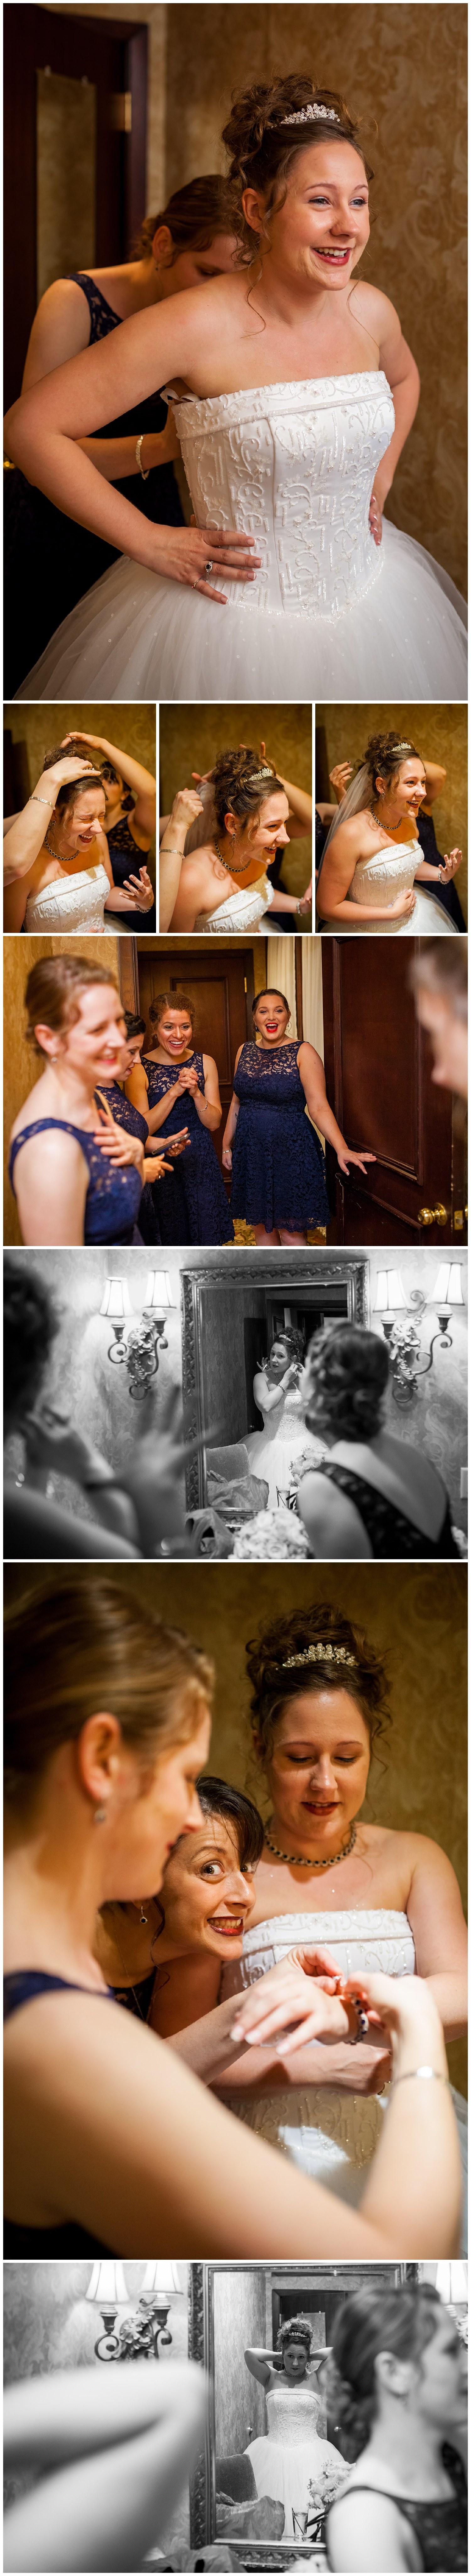 adam-waz-wedding-photographer-north kingstown-ri_0004.jpg